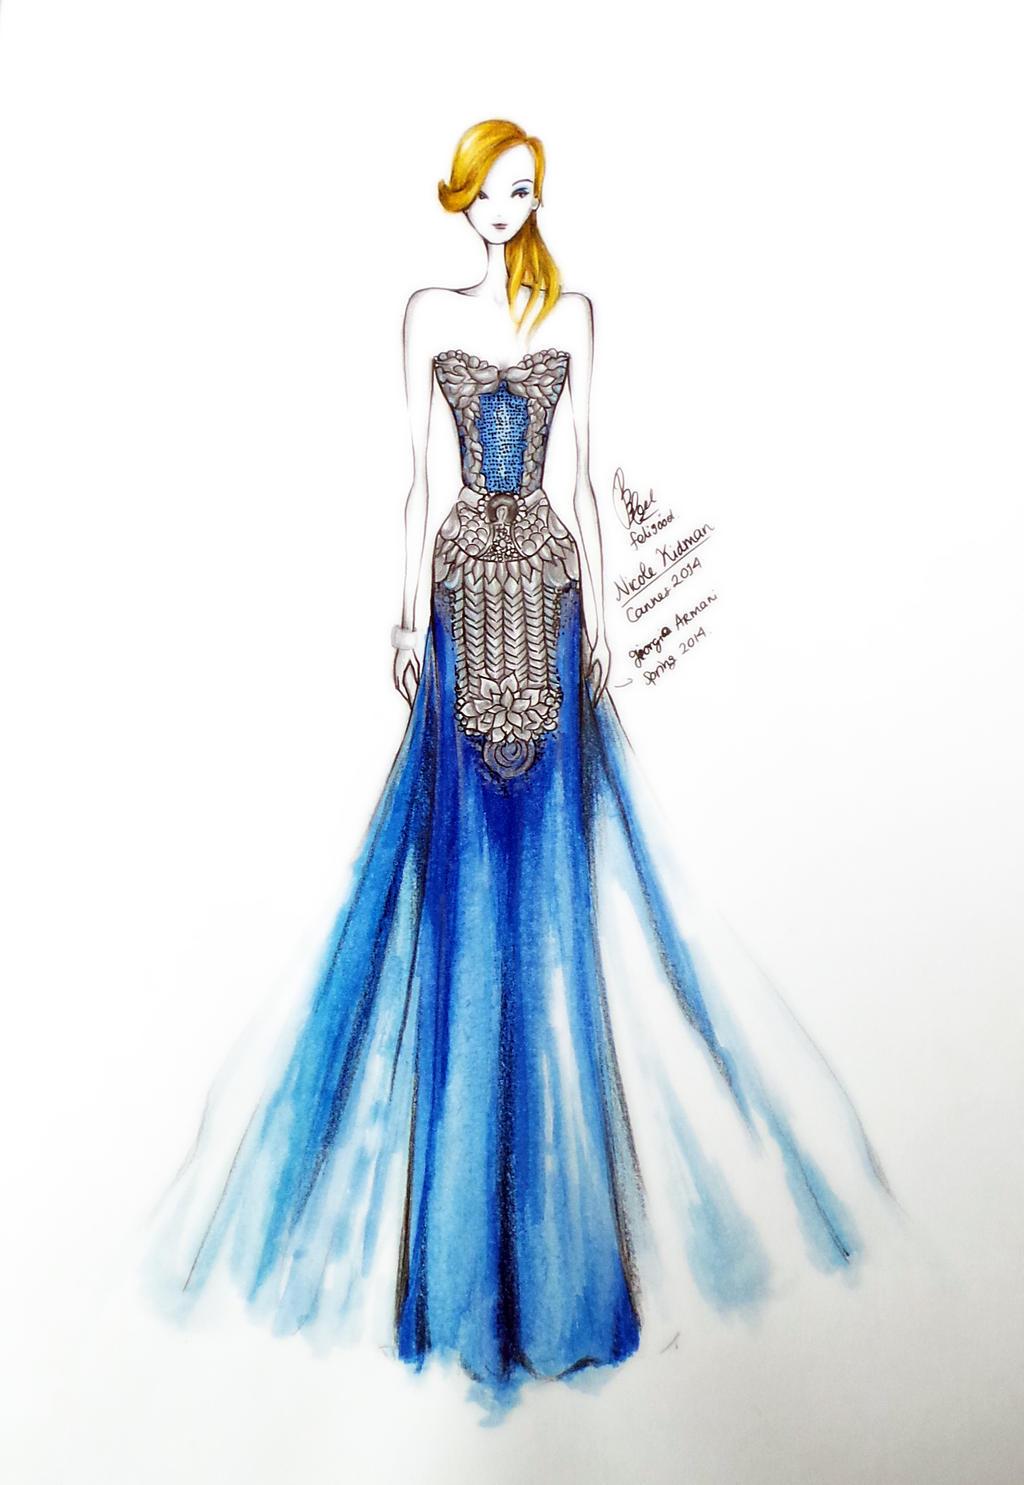 Nicole Kidman Cannes 2014 by eightzerooneeight on deviantART Giorgio Armani Figurines